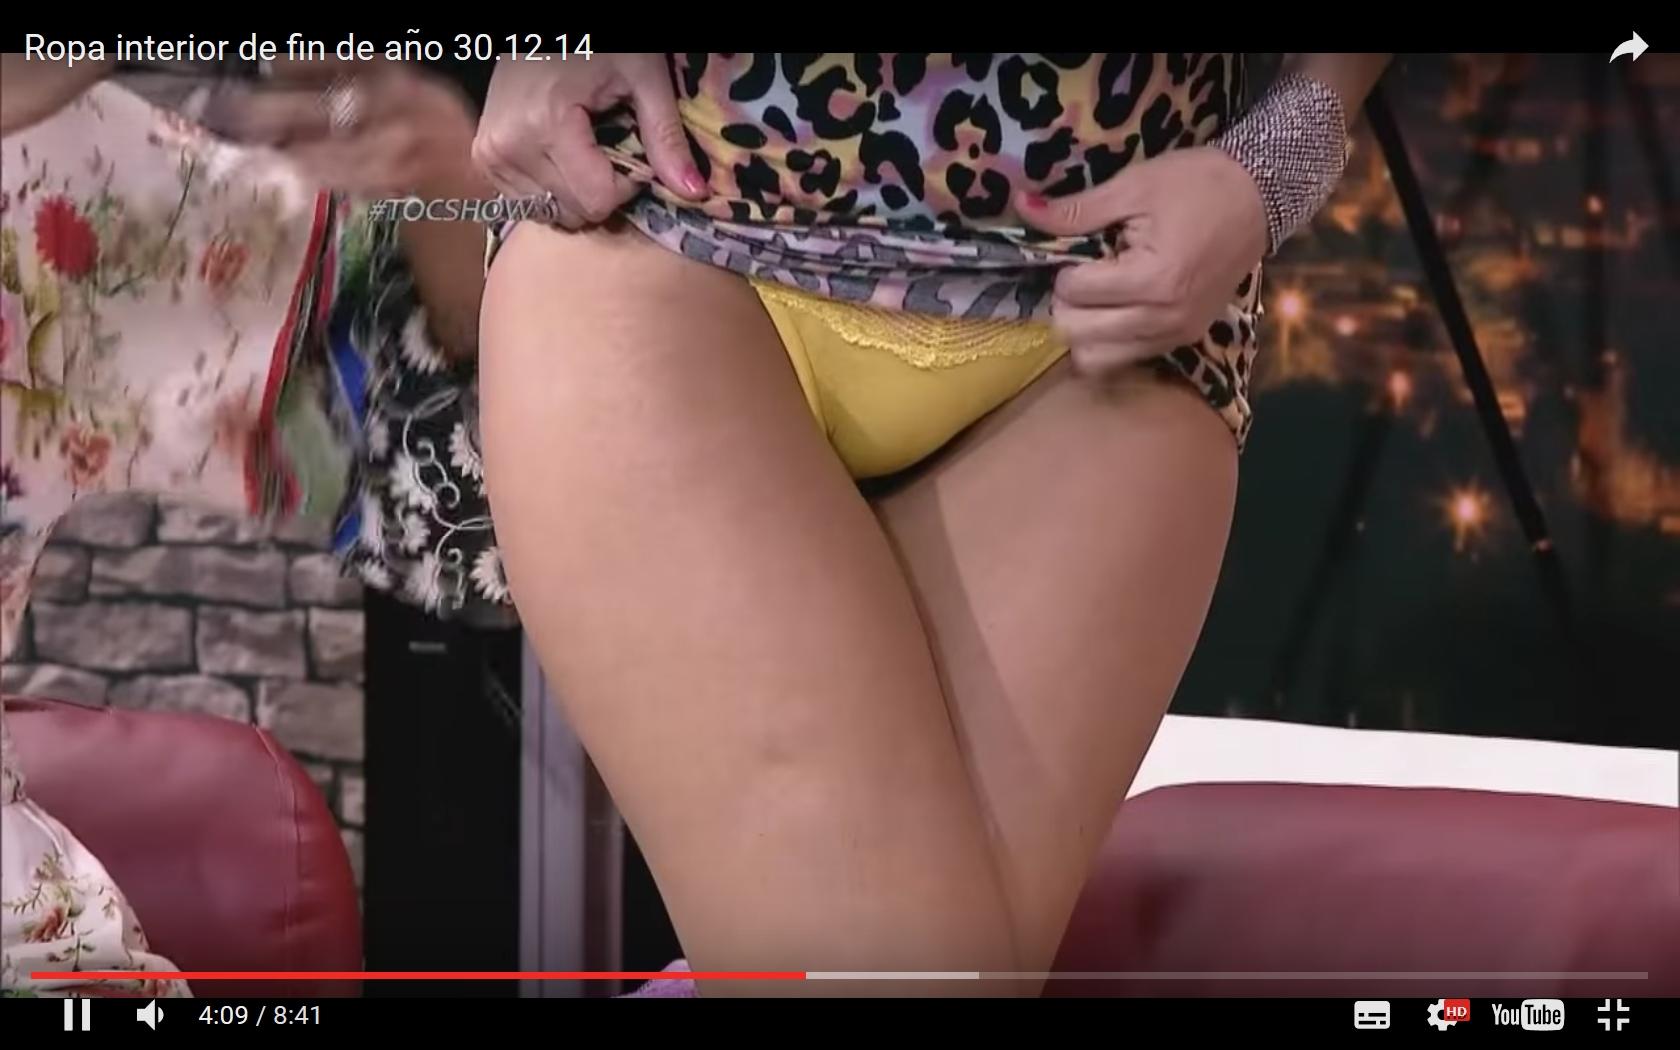 Toc Show Skirt Lifting – Hotties show panties | Daily Girls @ Female Update